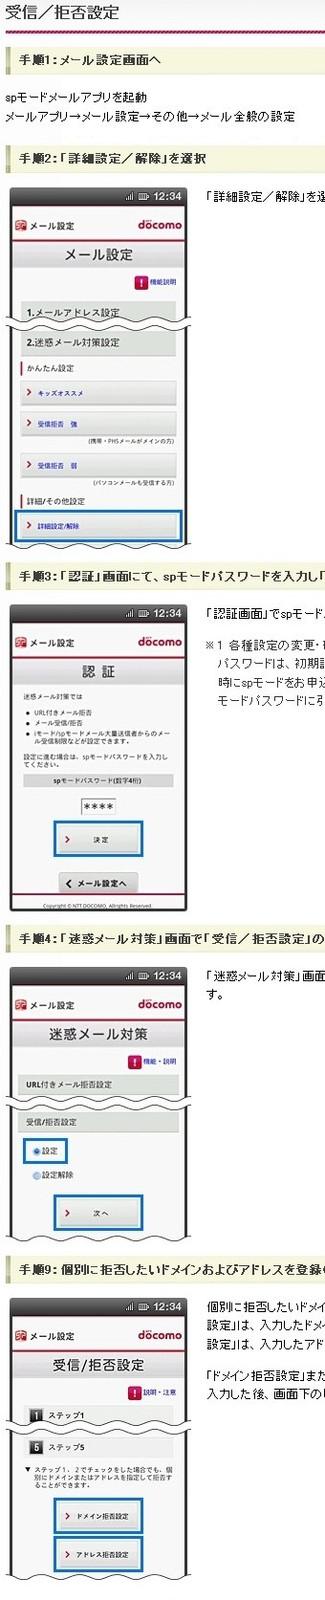 Docomodomainkyohi_01